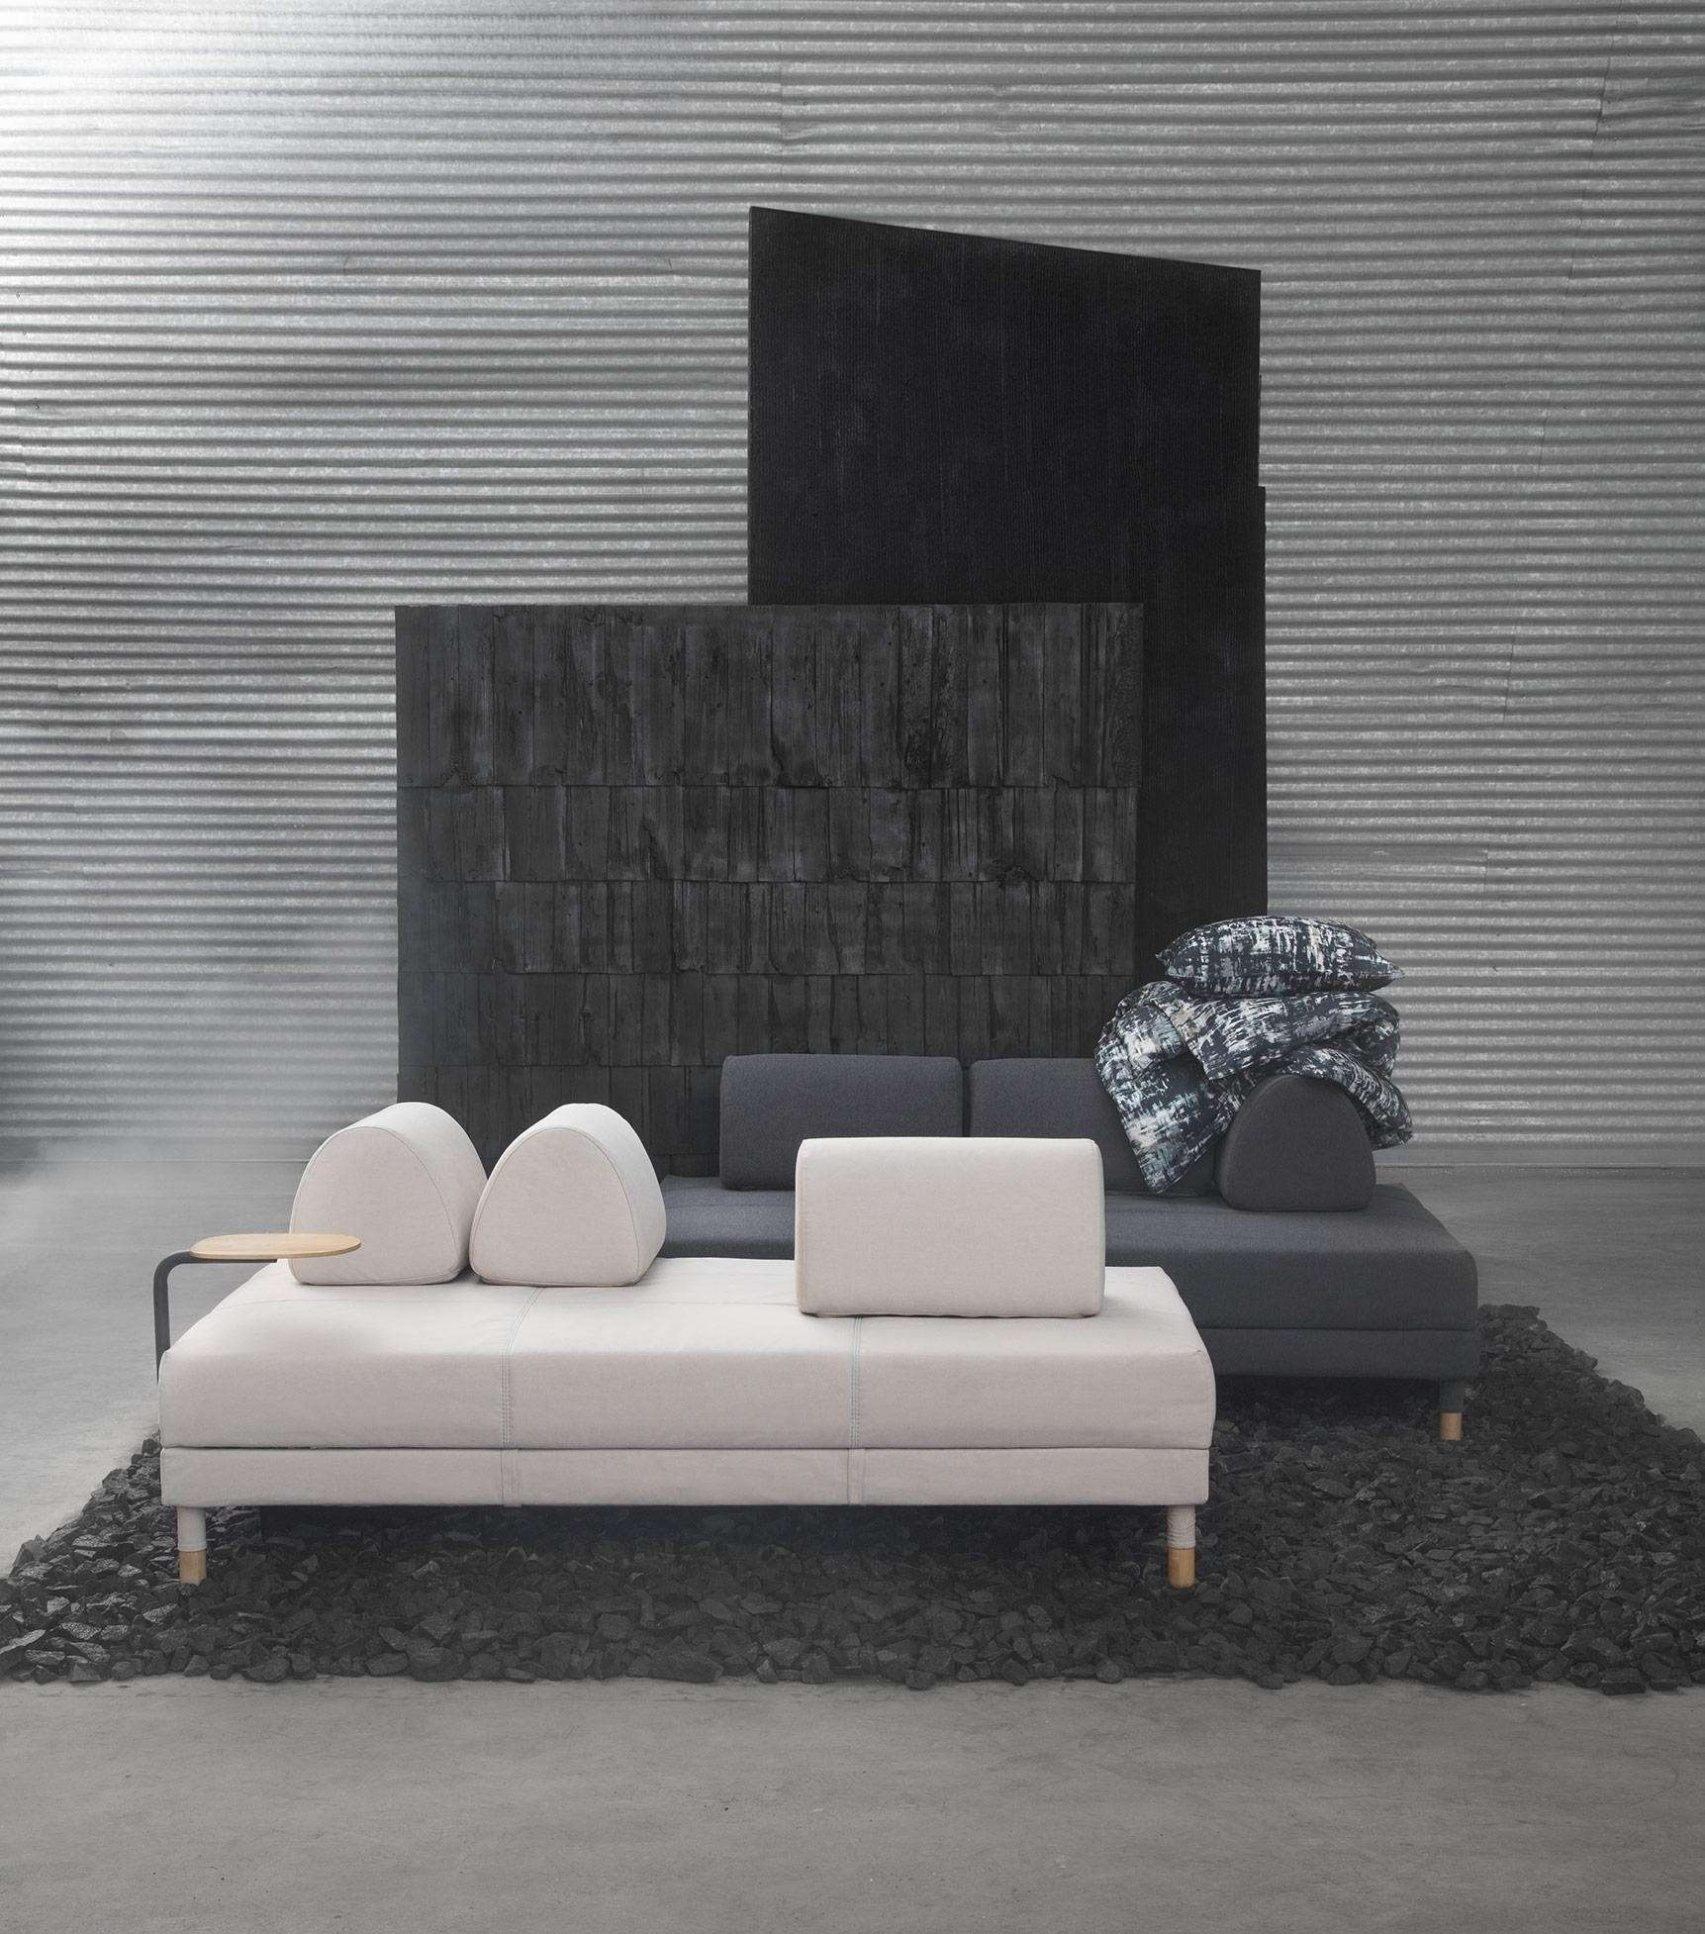 Lit Voiture Ikea Nouveau Maha De Lit Metal Blanc Mahagranda De Home